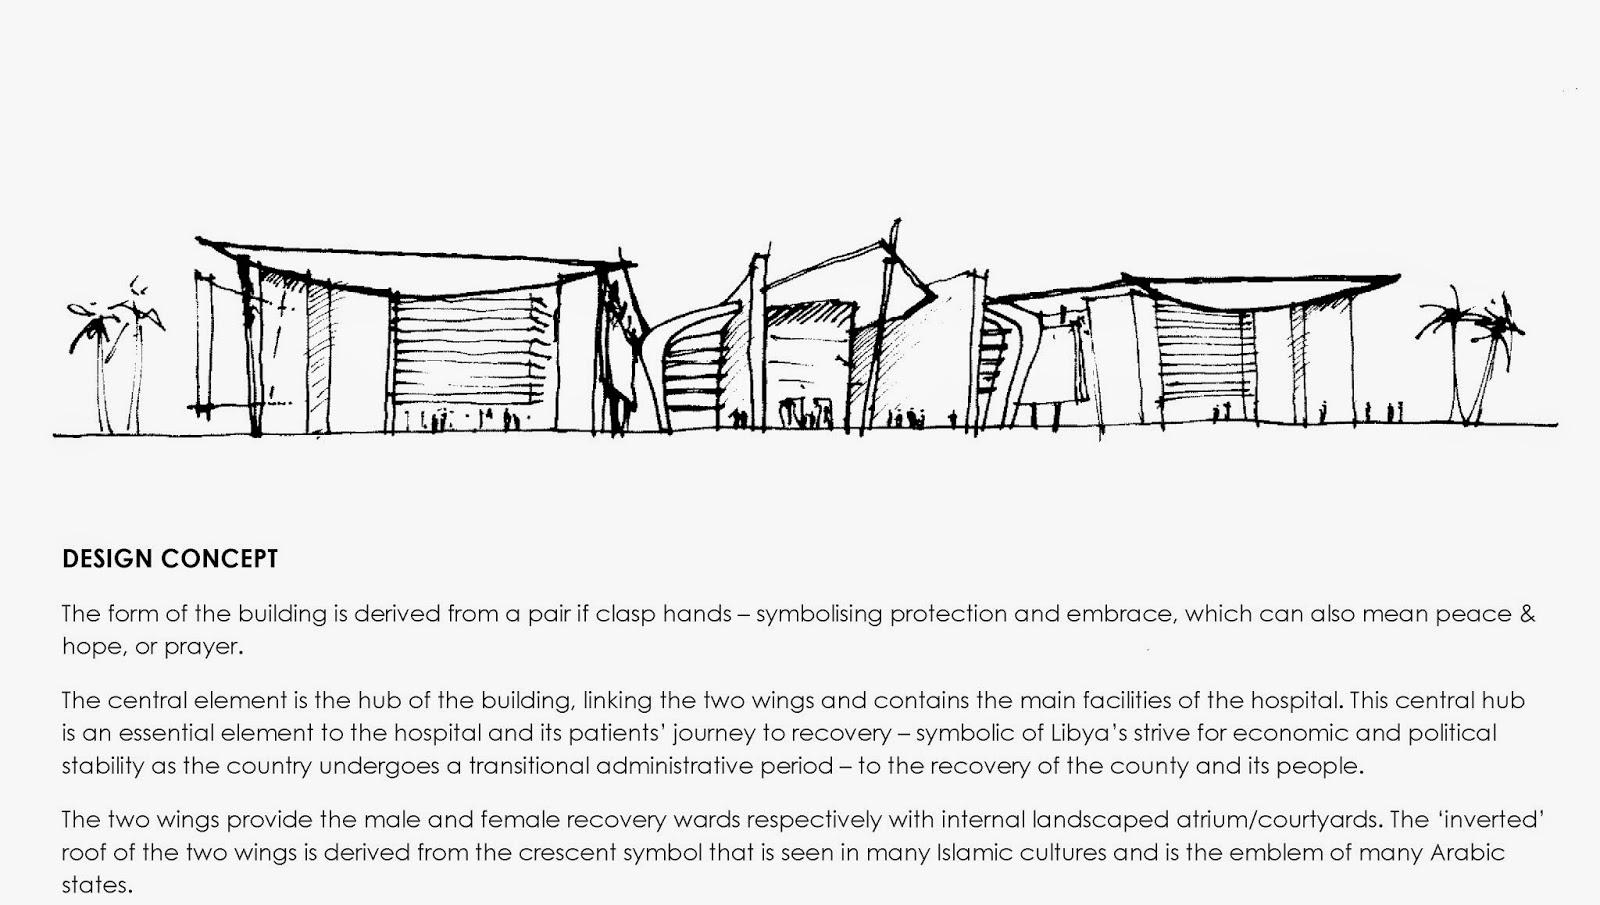 simon tong ARCHITECTURE PORTFOLIO: Concept Design for a new